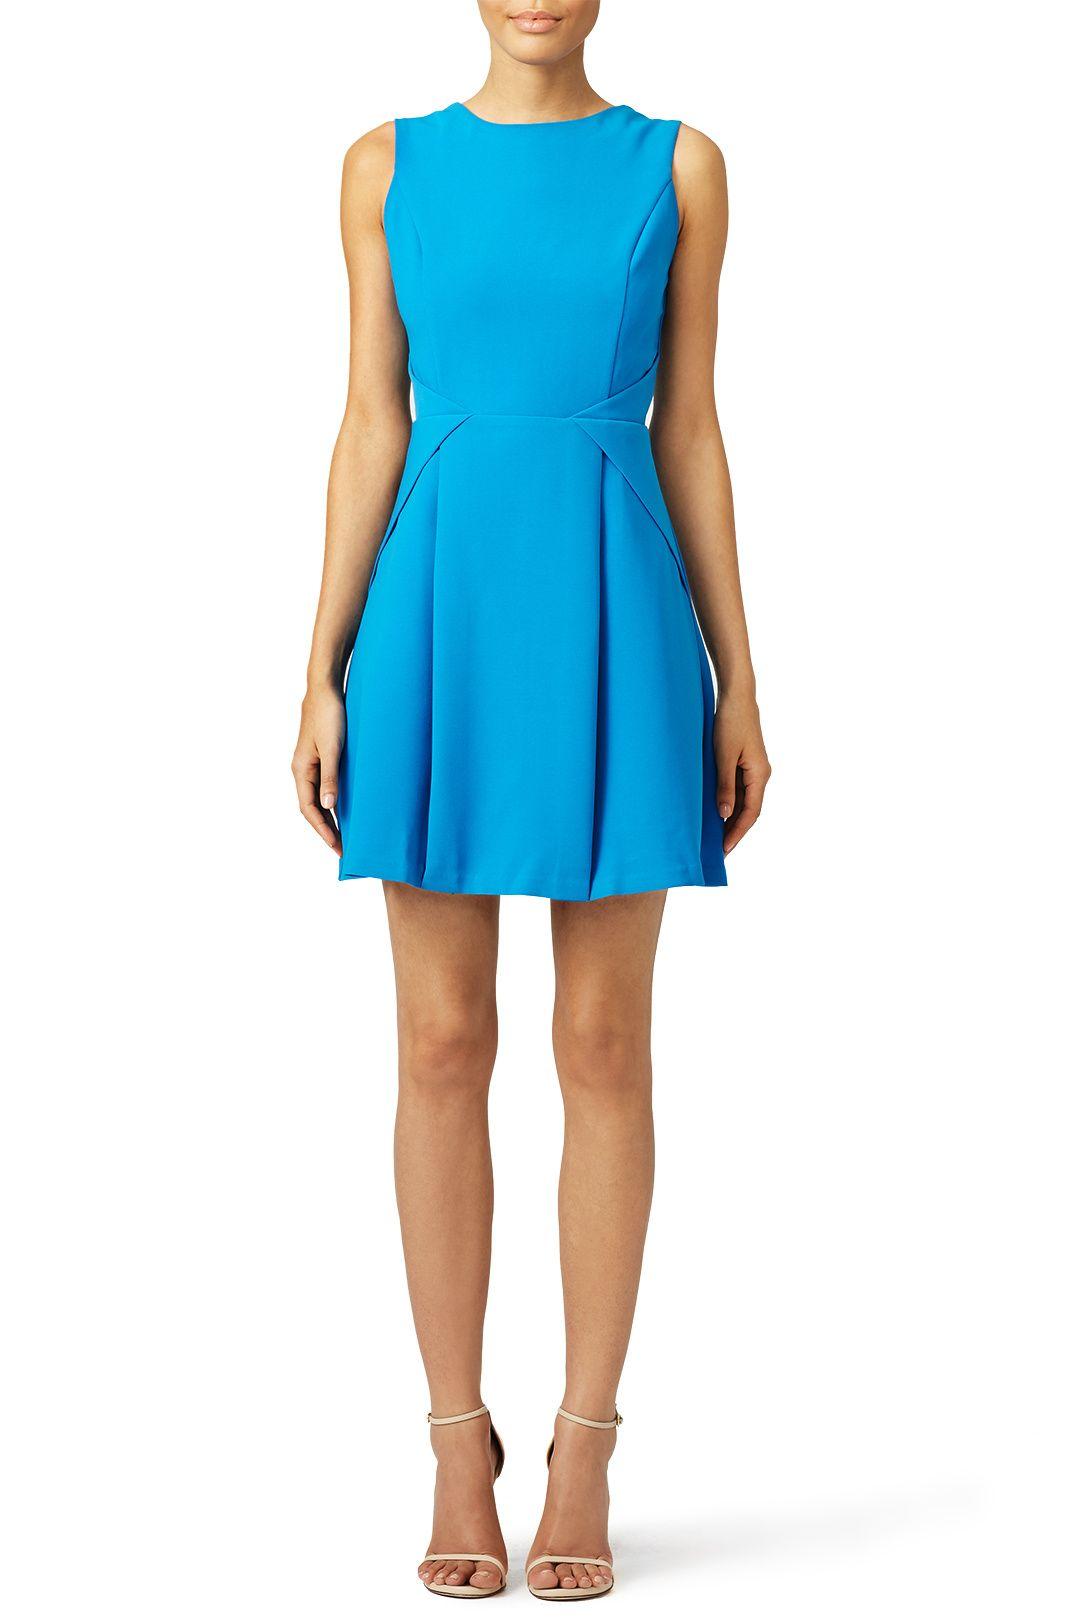 Blue Offshore Dress | Bright blue dresses, Blue dresses and ...